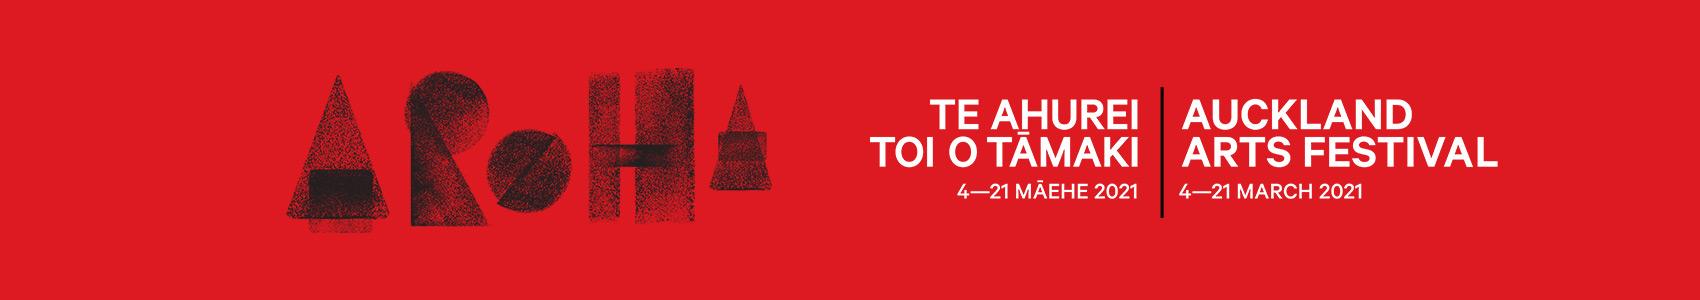 Auckland Arts Festival - Te Ahurei Toi o Tāmaki